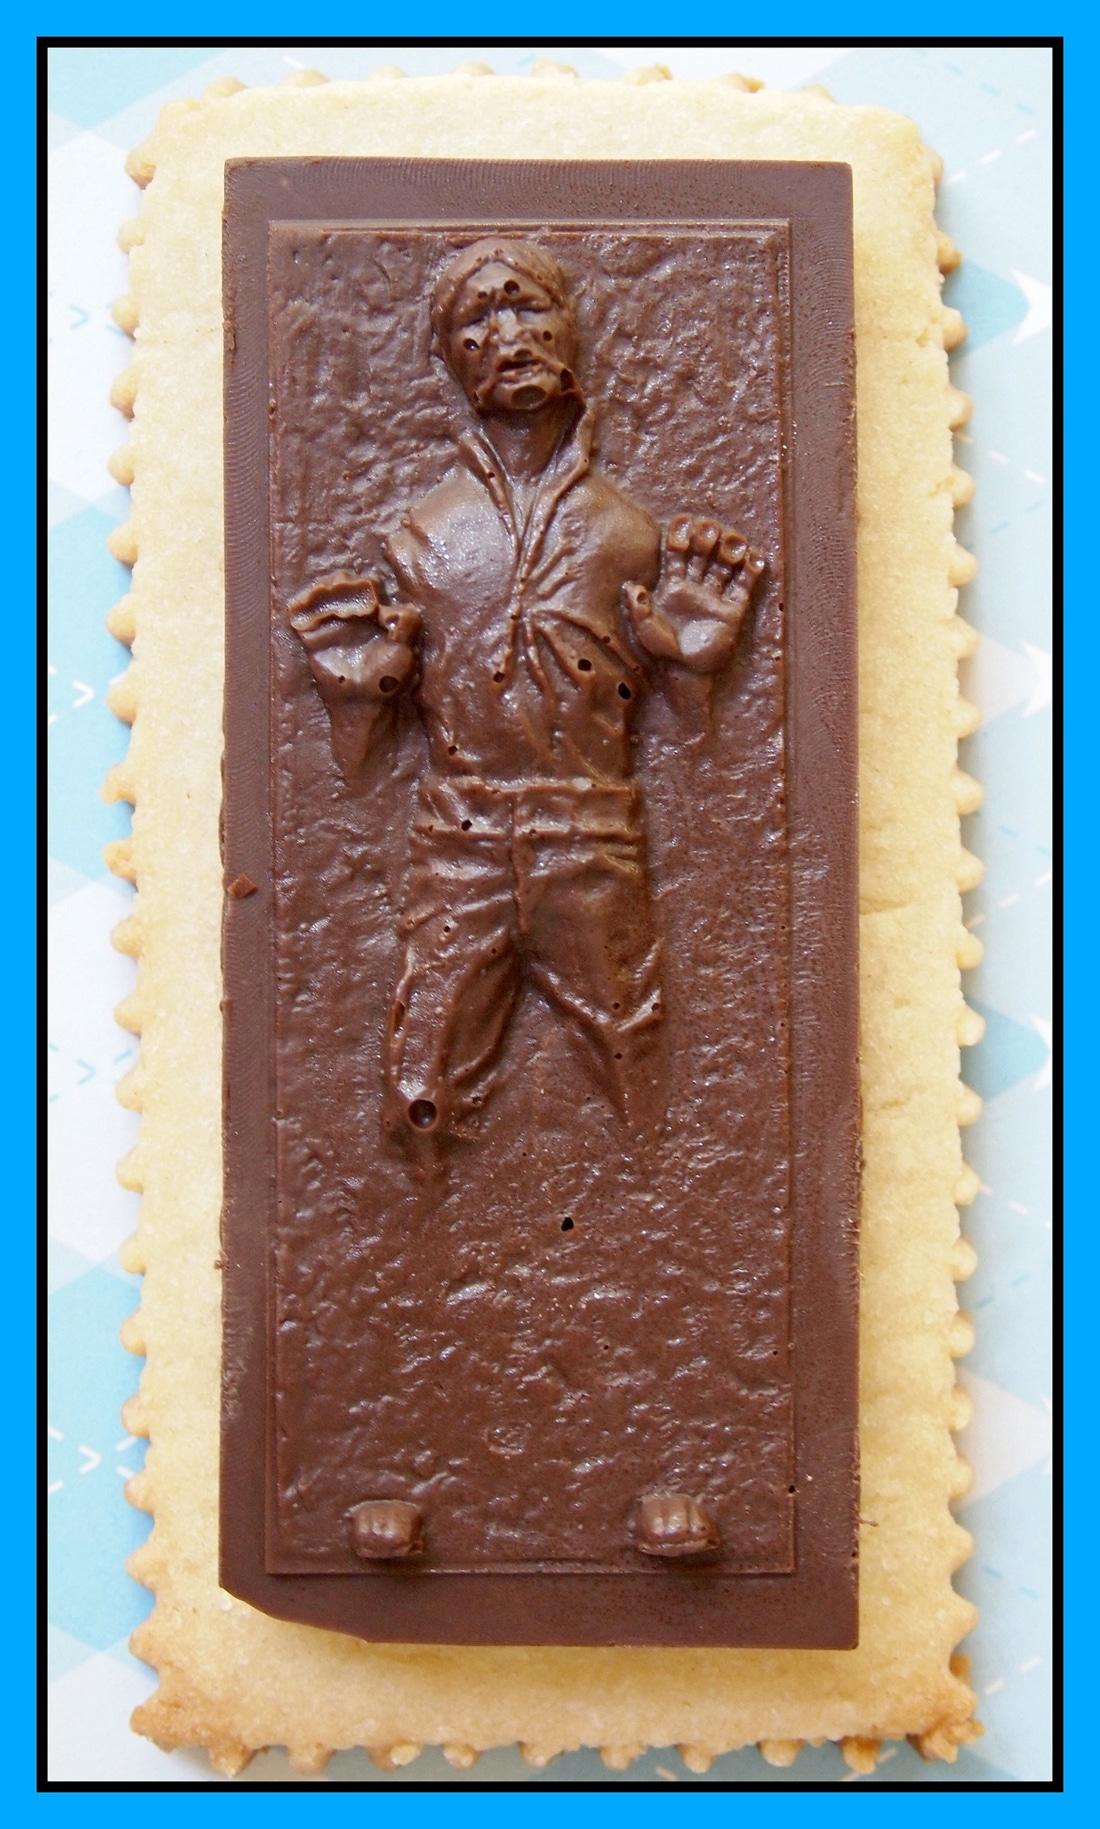 Han Solo In Carbonite Chocolate Sugar Cookies